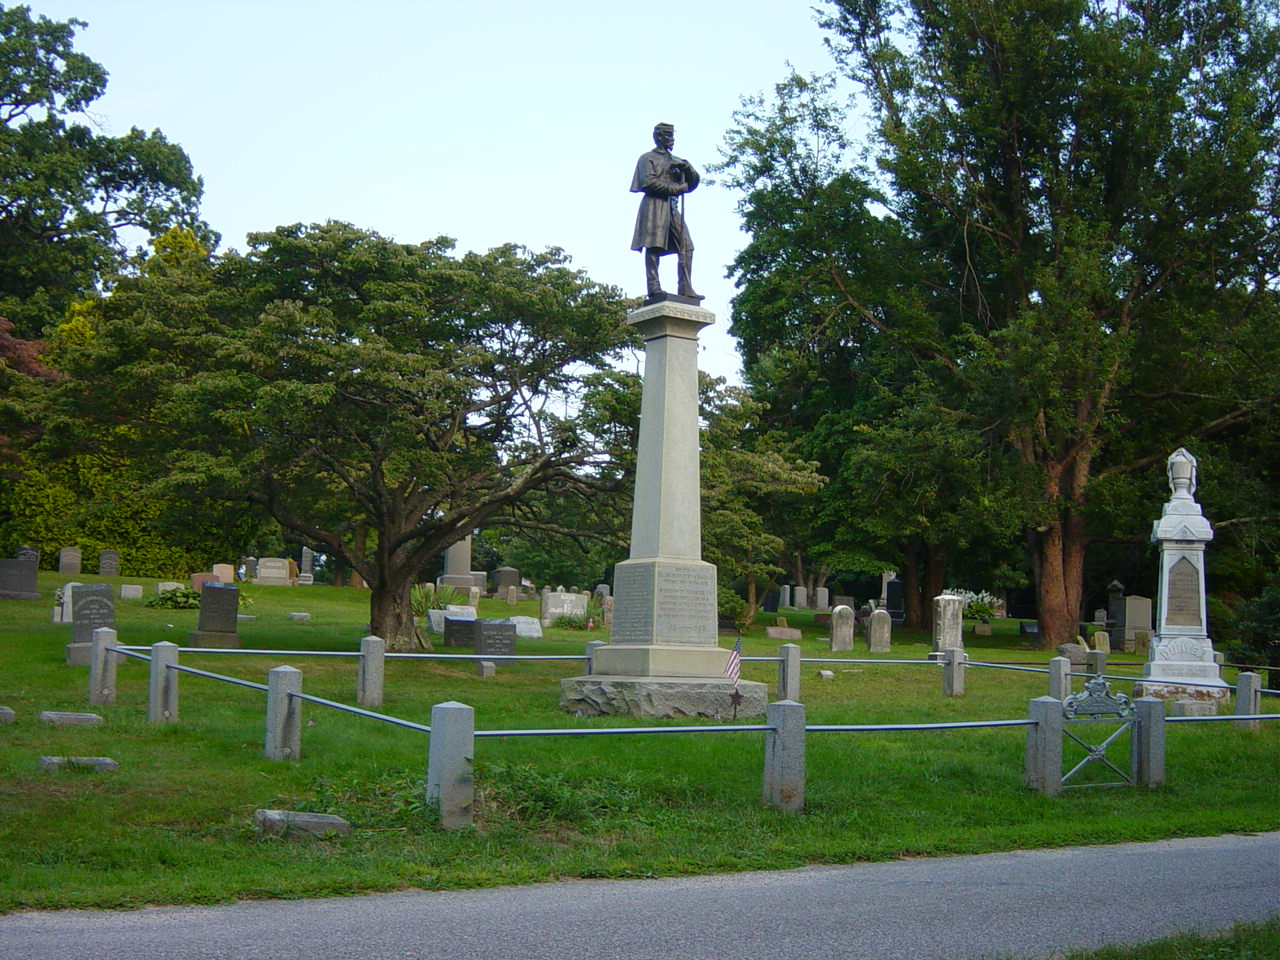 Elijah Ward Post No. 654 G.A.R. Monument, Roslyn Cemetery, Roslyn, New York.